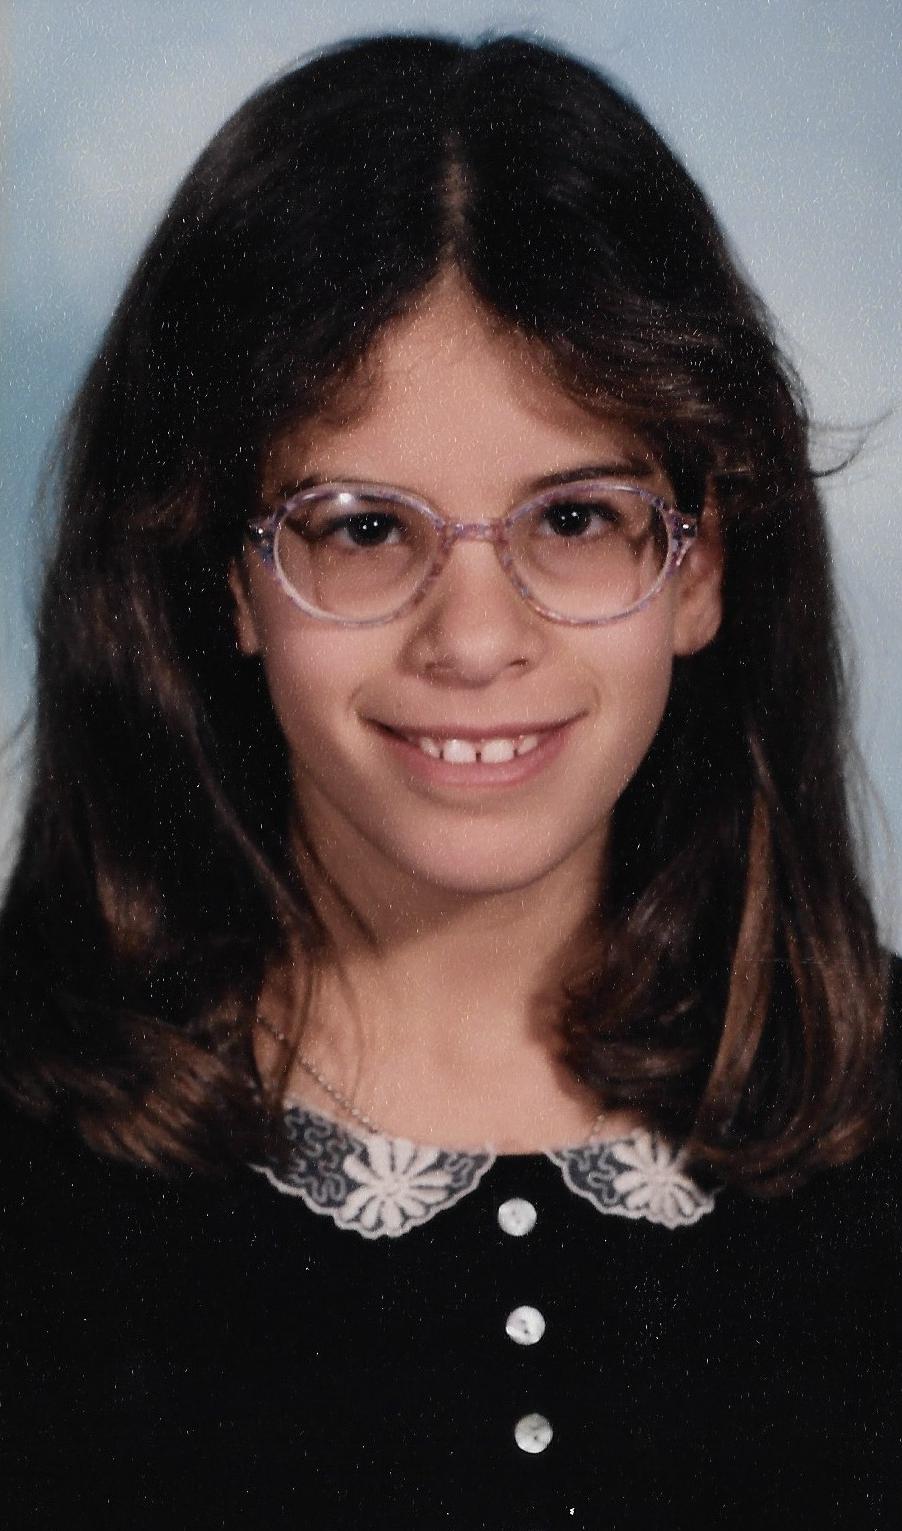 Danielle Place Kid Picture